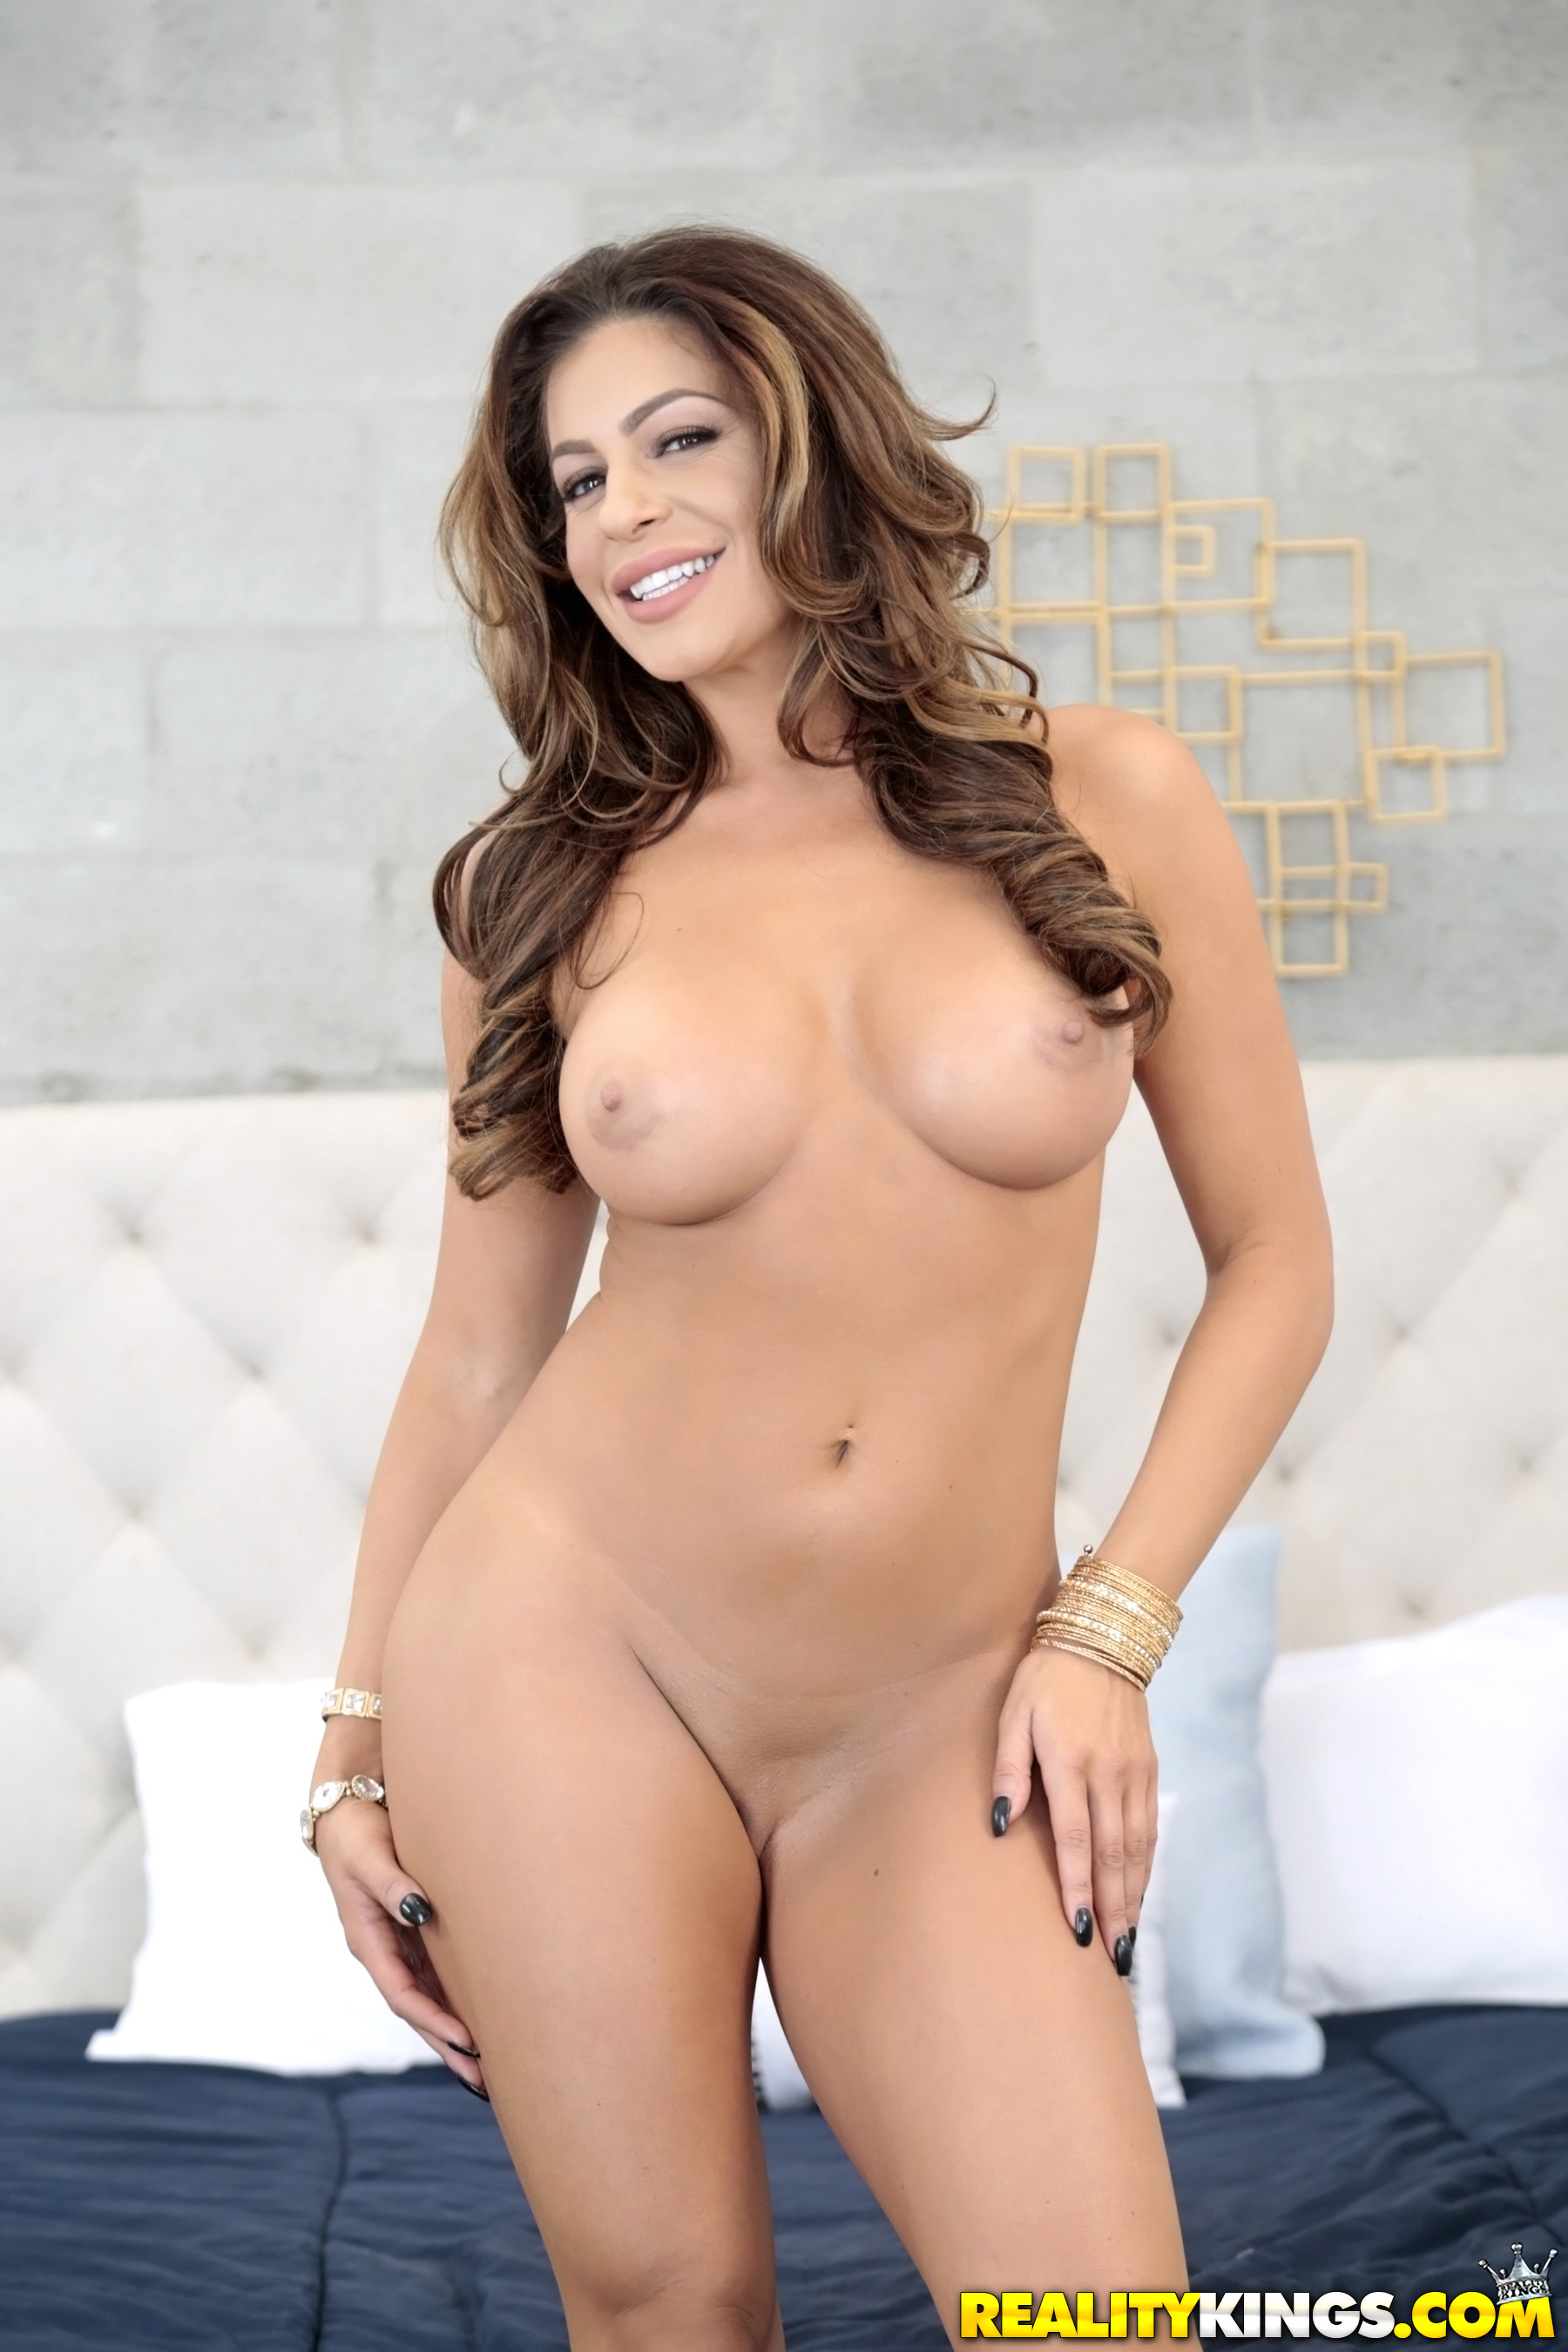 Nikki capone nude